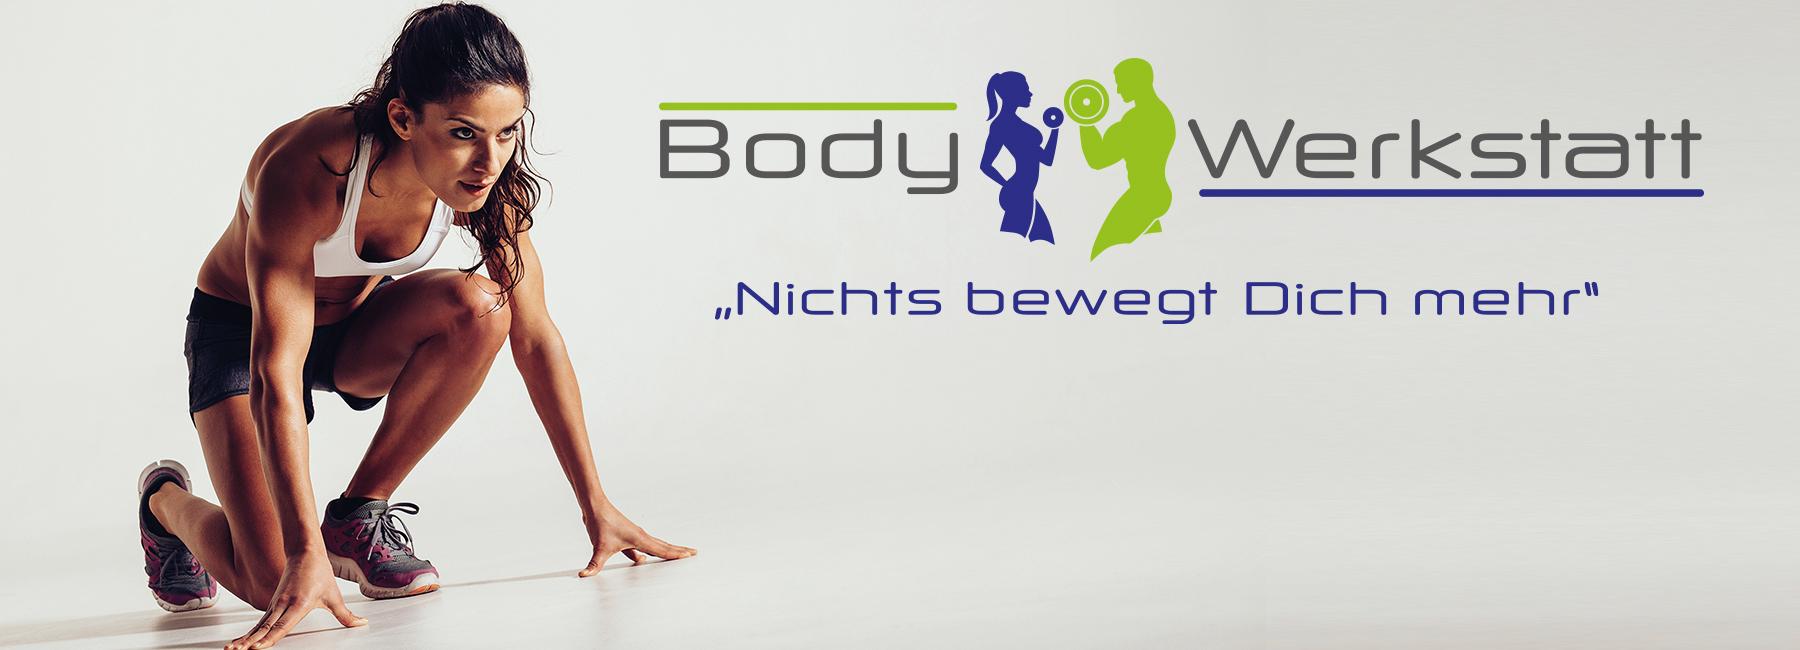 Bodywerkstatt - das Premium-Fitnessstudio in Starnberg-Perchting